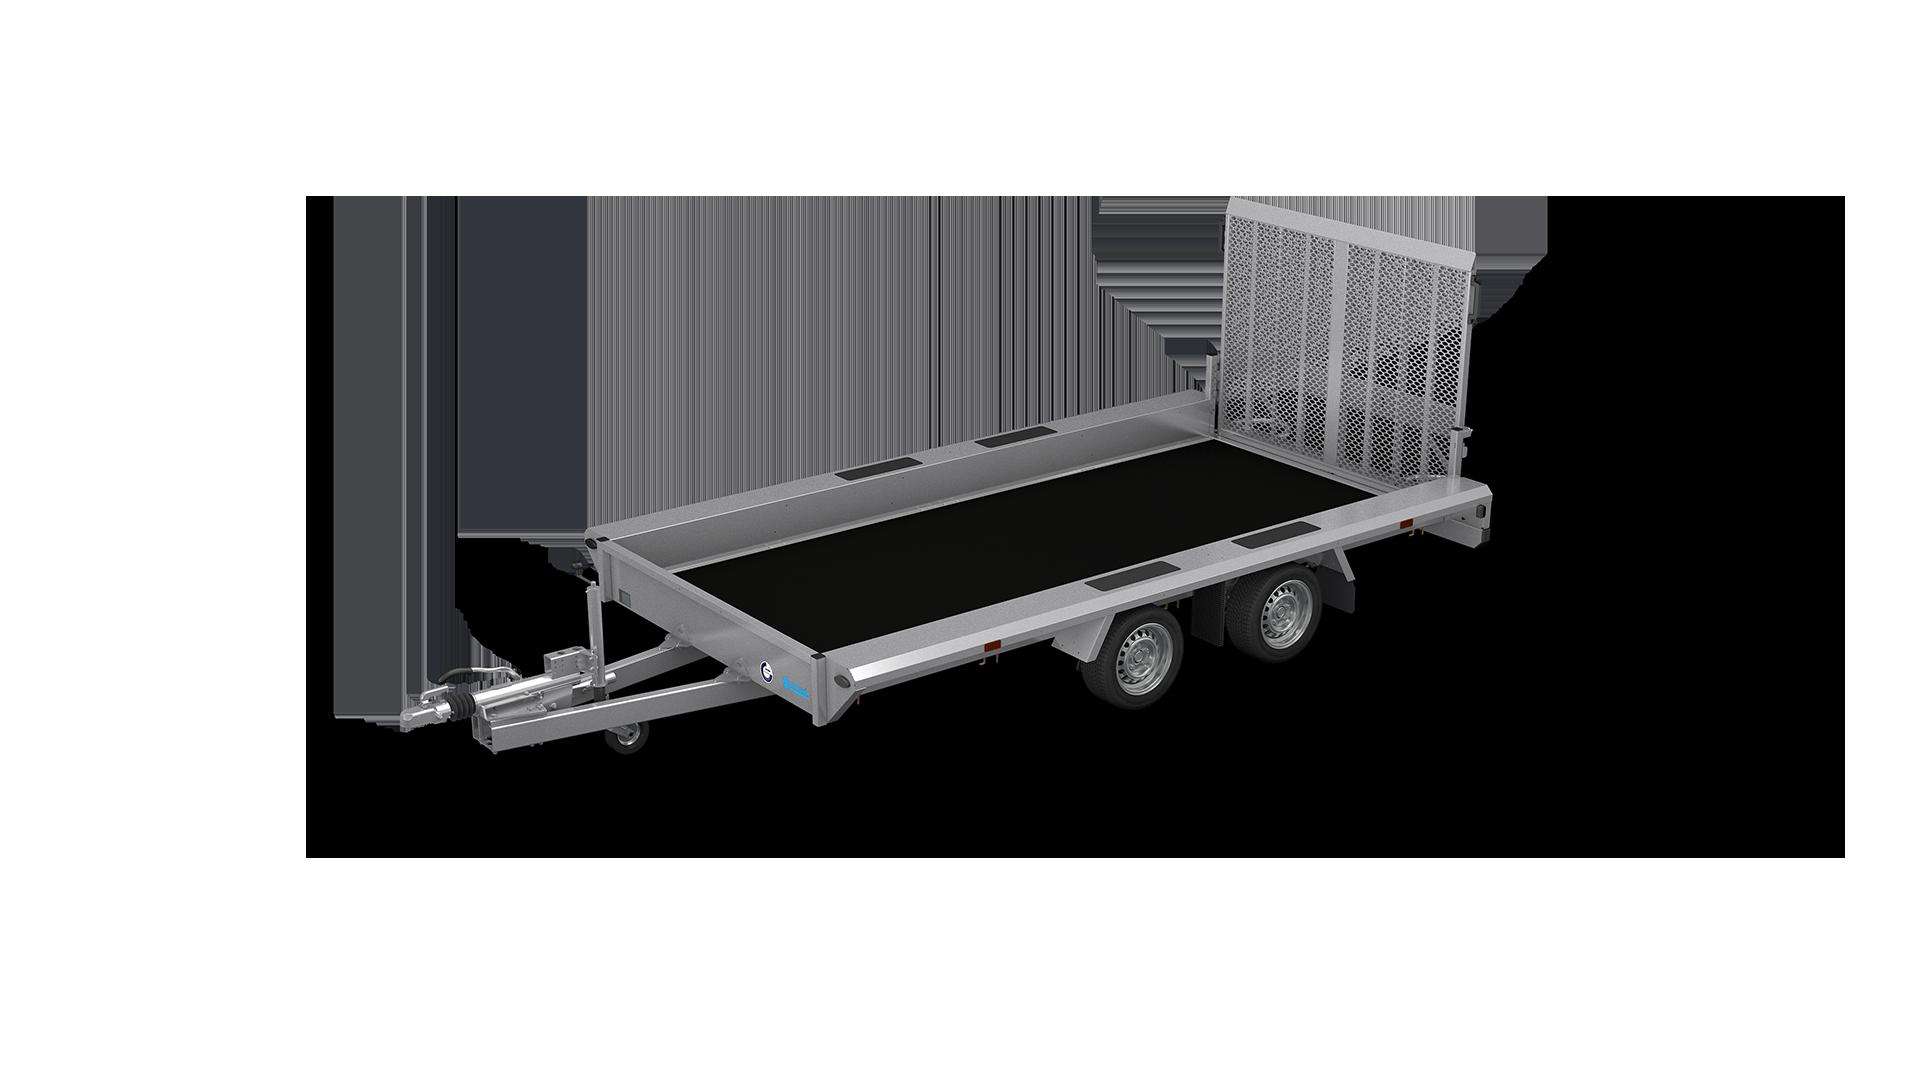 HAPERT transport trailer INDIGO LF-2 non-tilting machine transporter